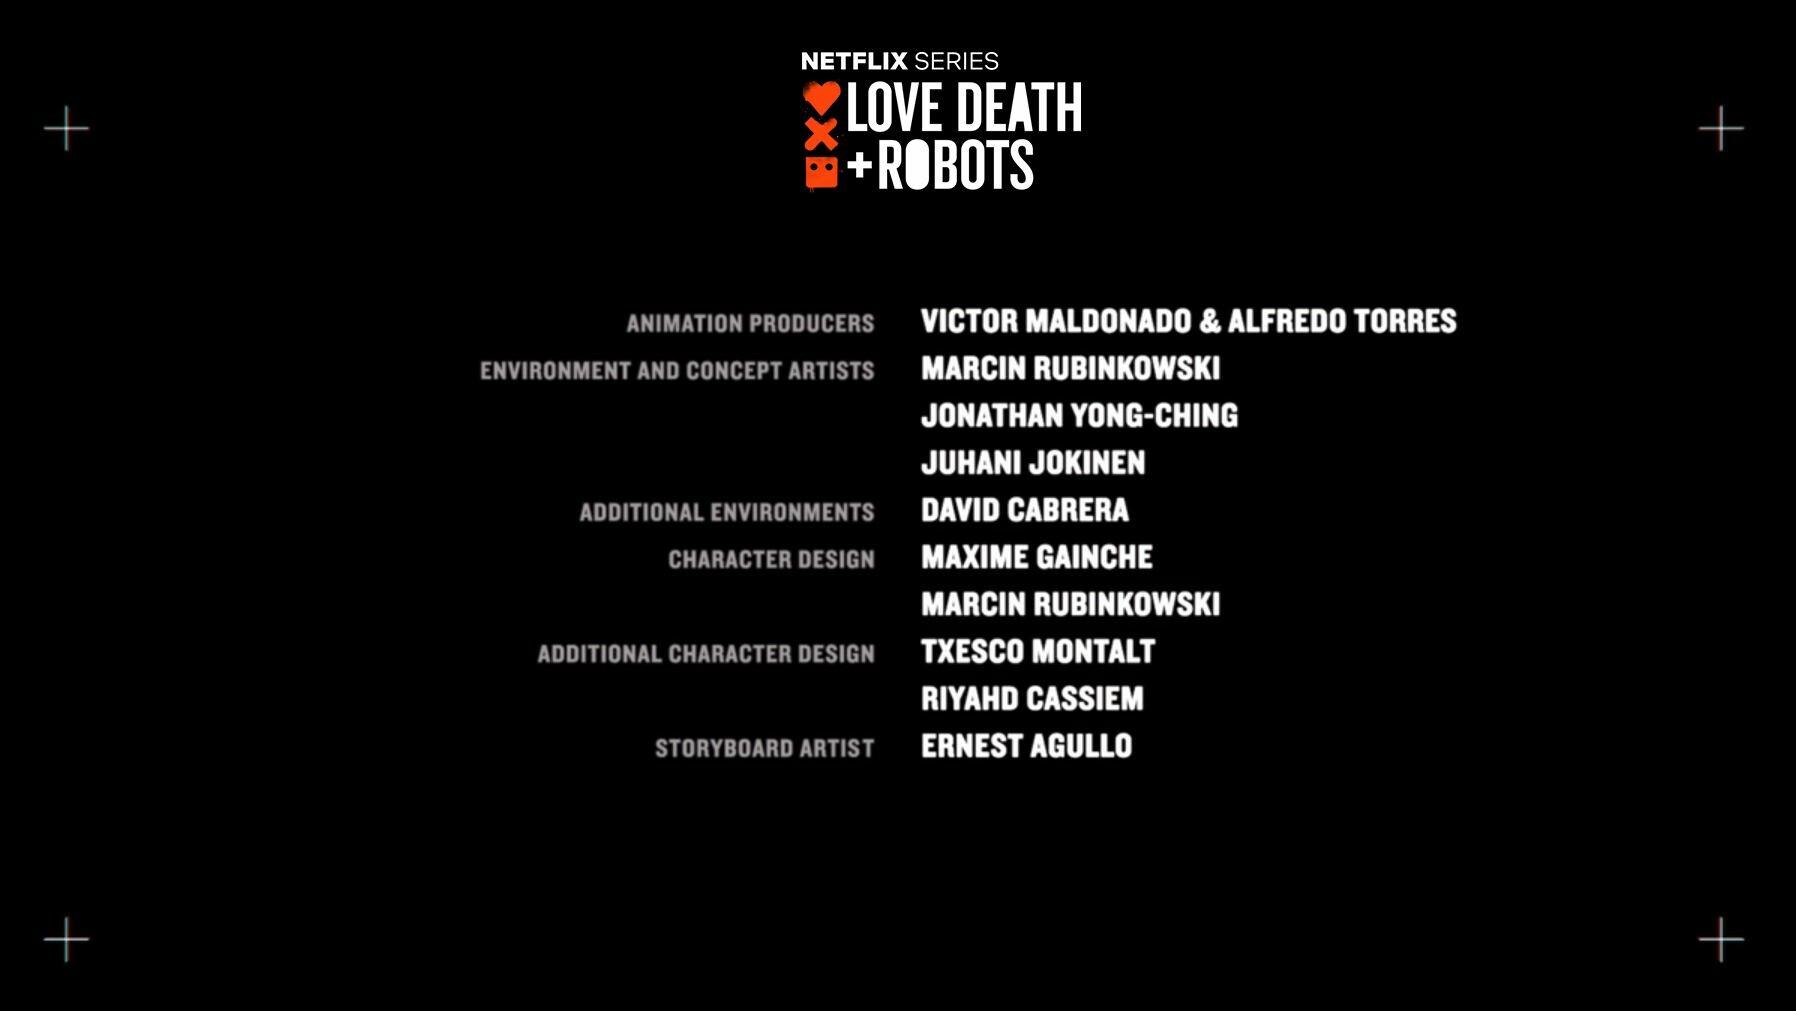 Marcin rubinkowski three robots credits